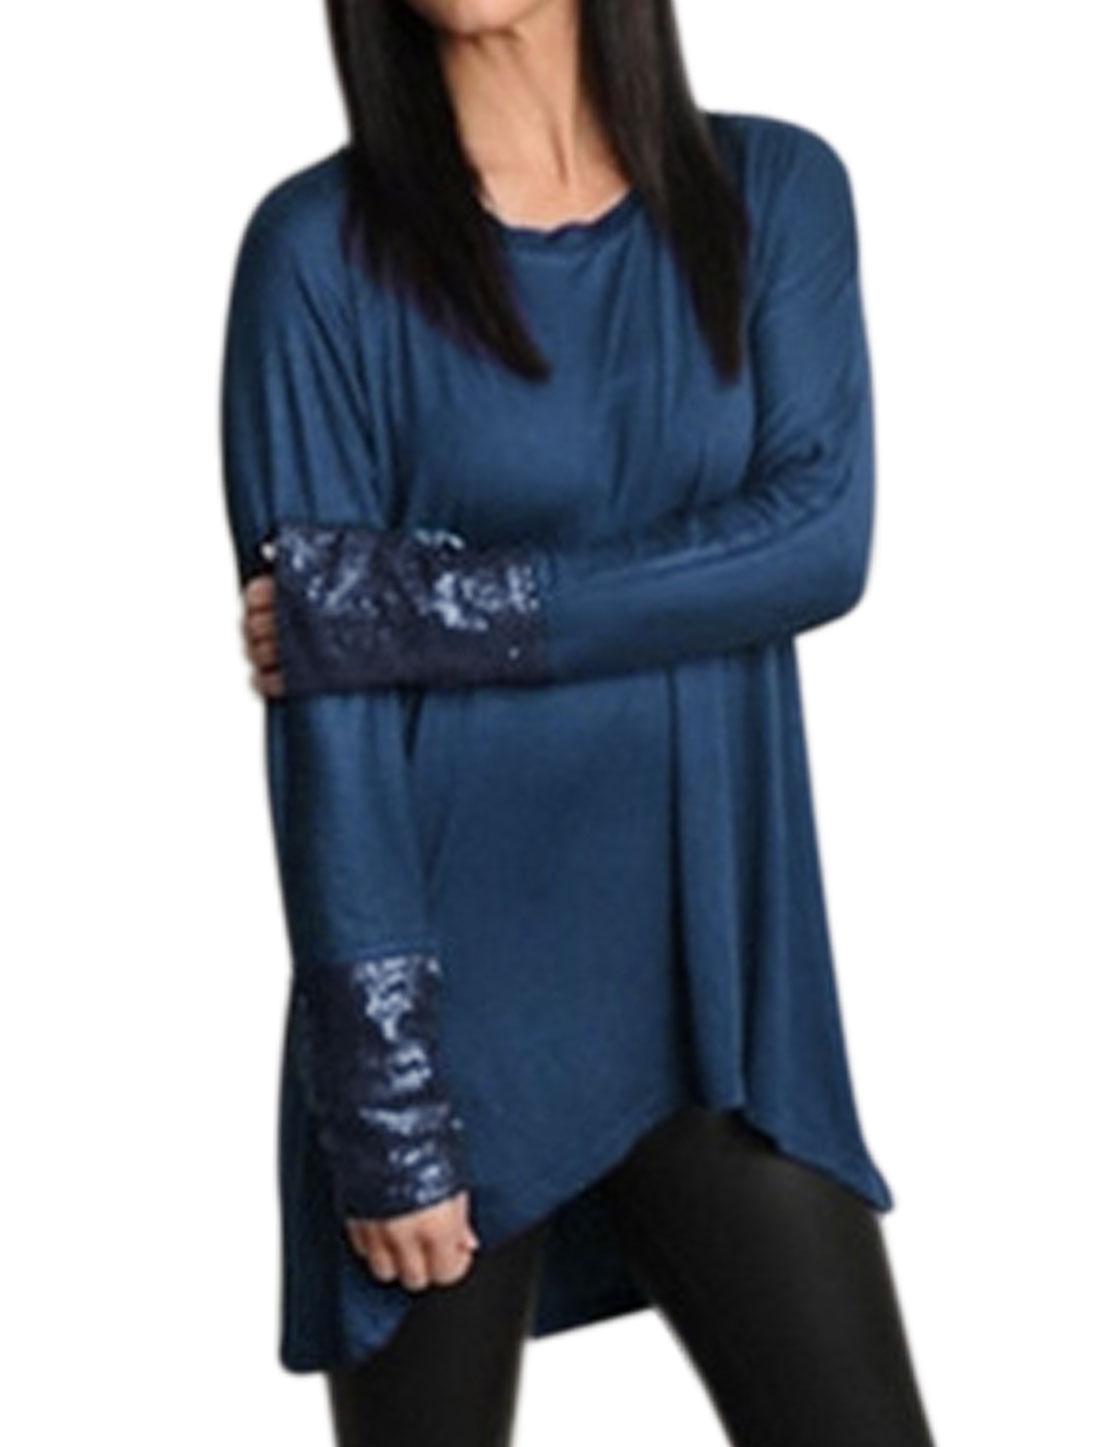 Women Scoop Neck Long Raglan Sleeves Sequined High Low Hem Tunic Top Blue S